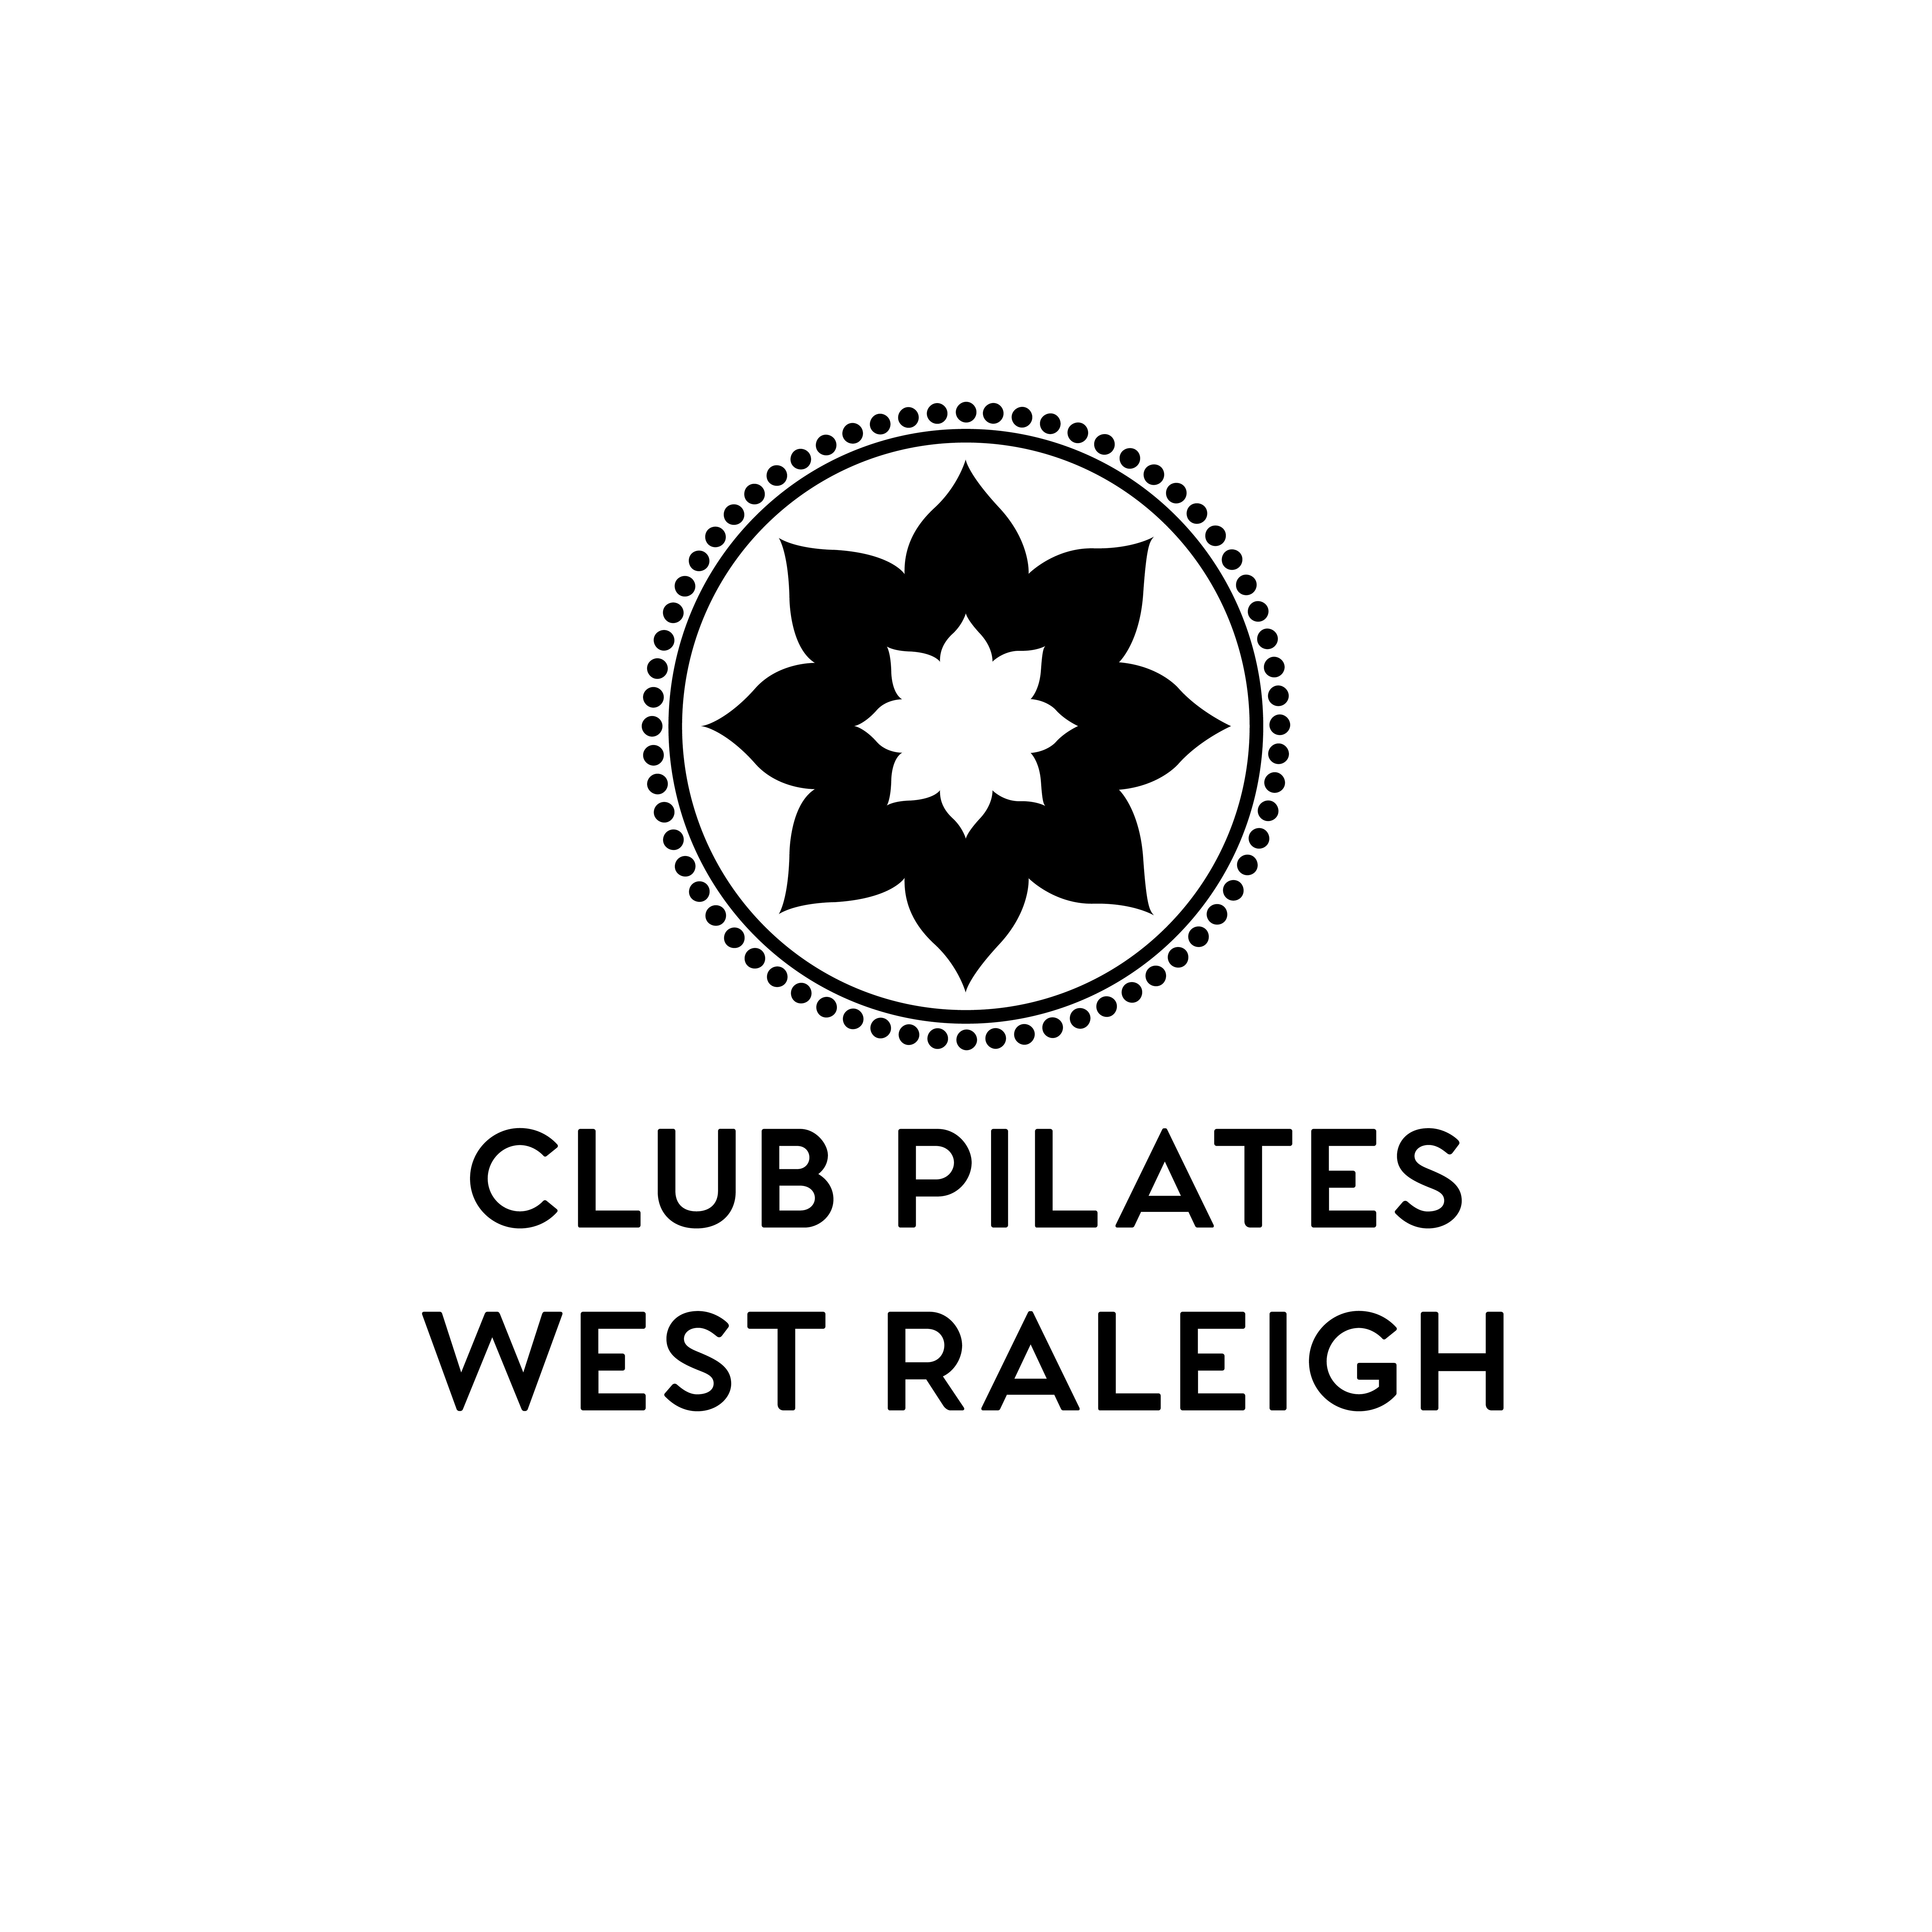 Sponsor Club Pilates West Raleigh